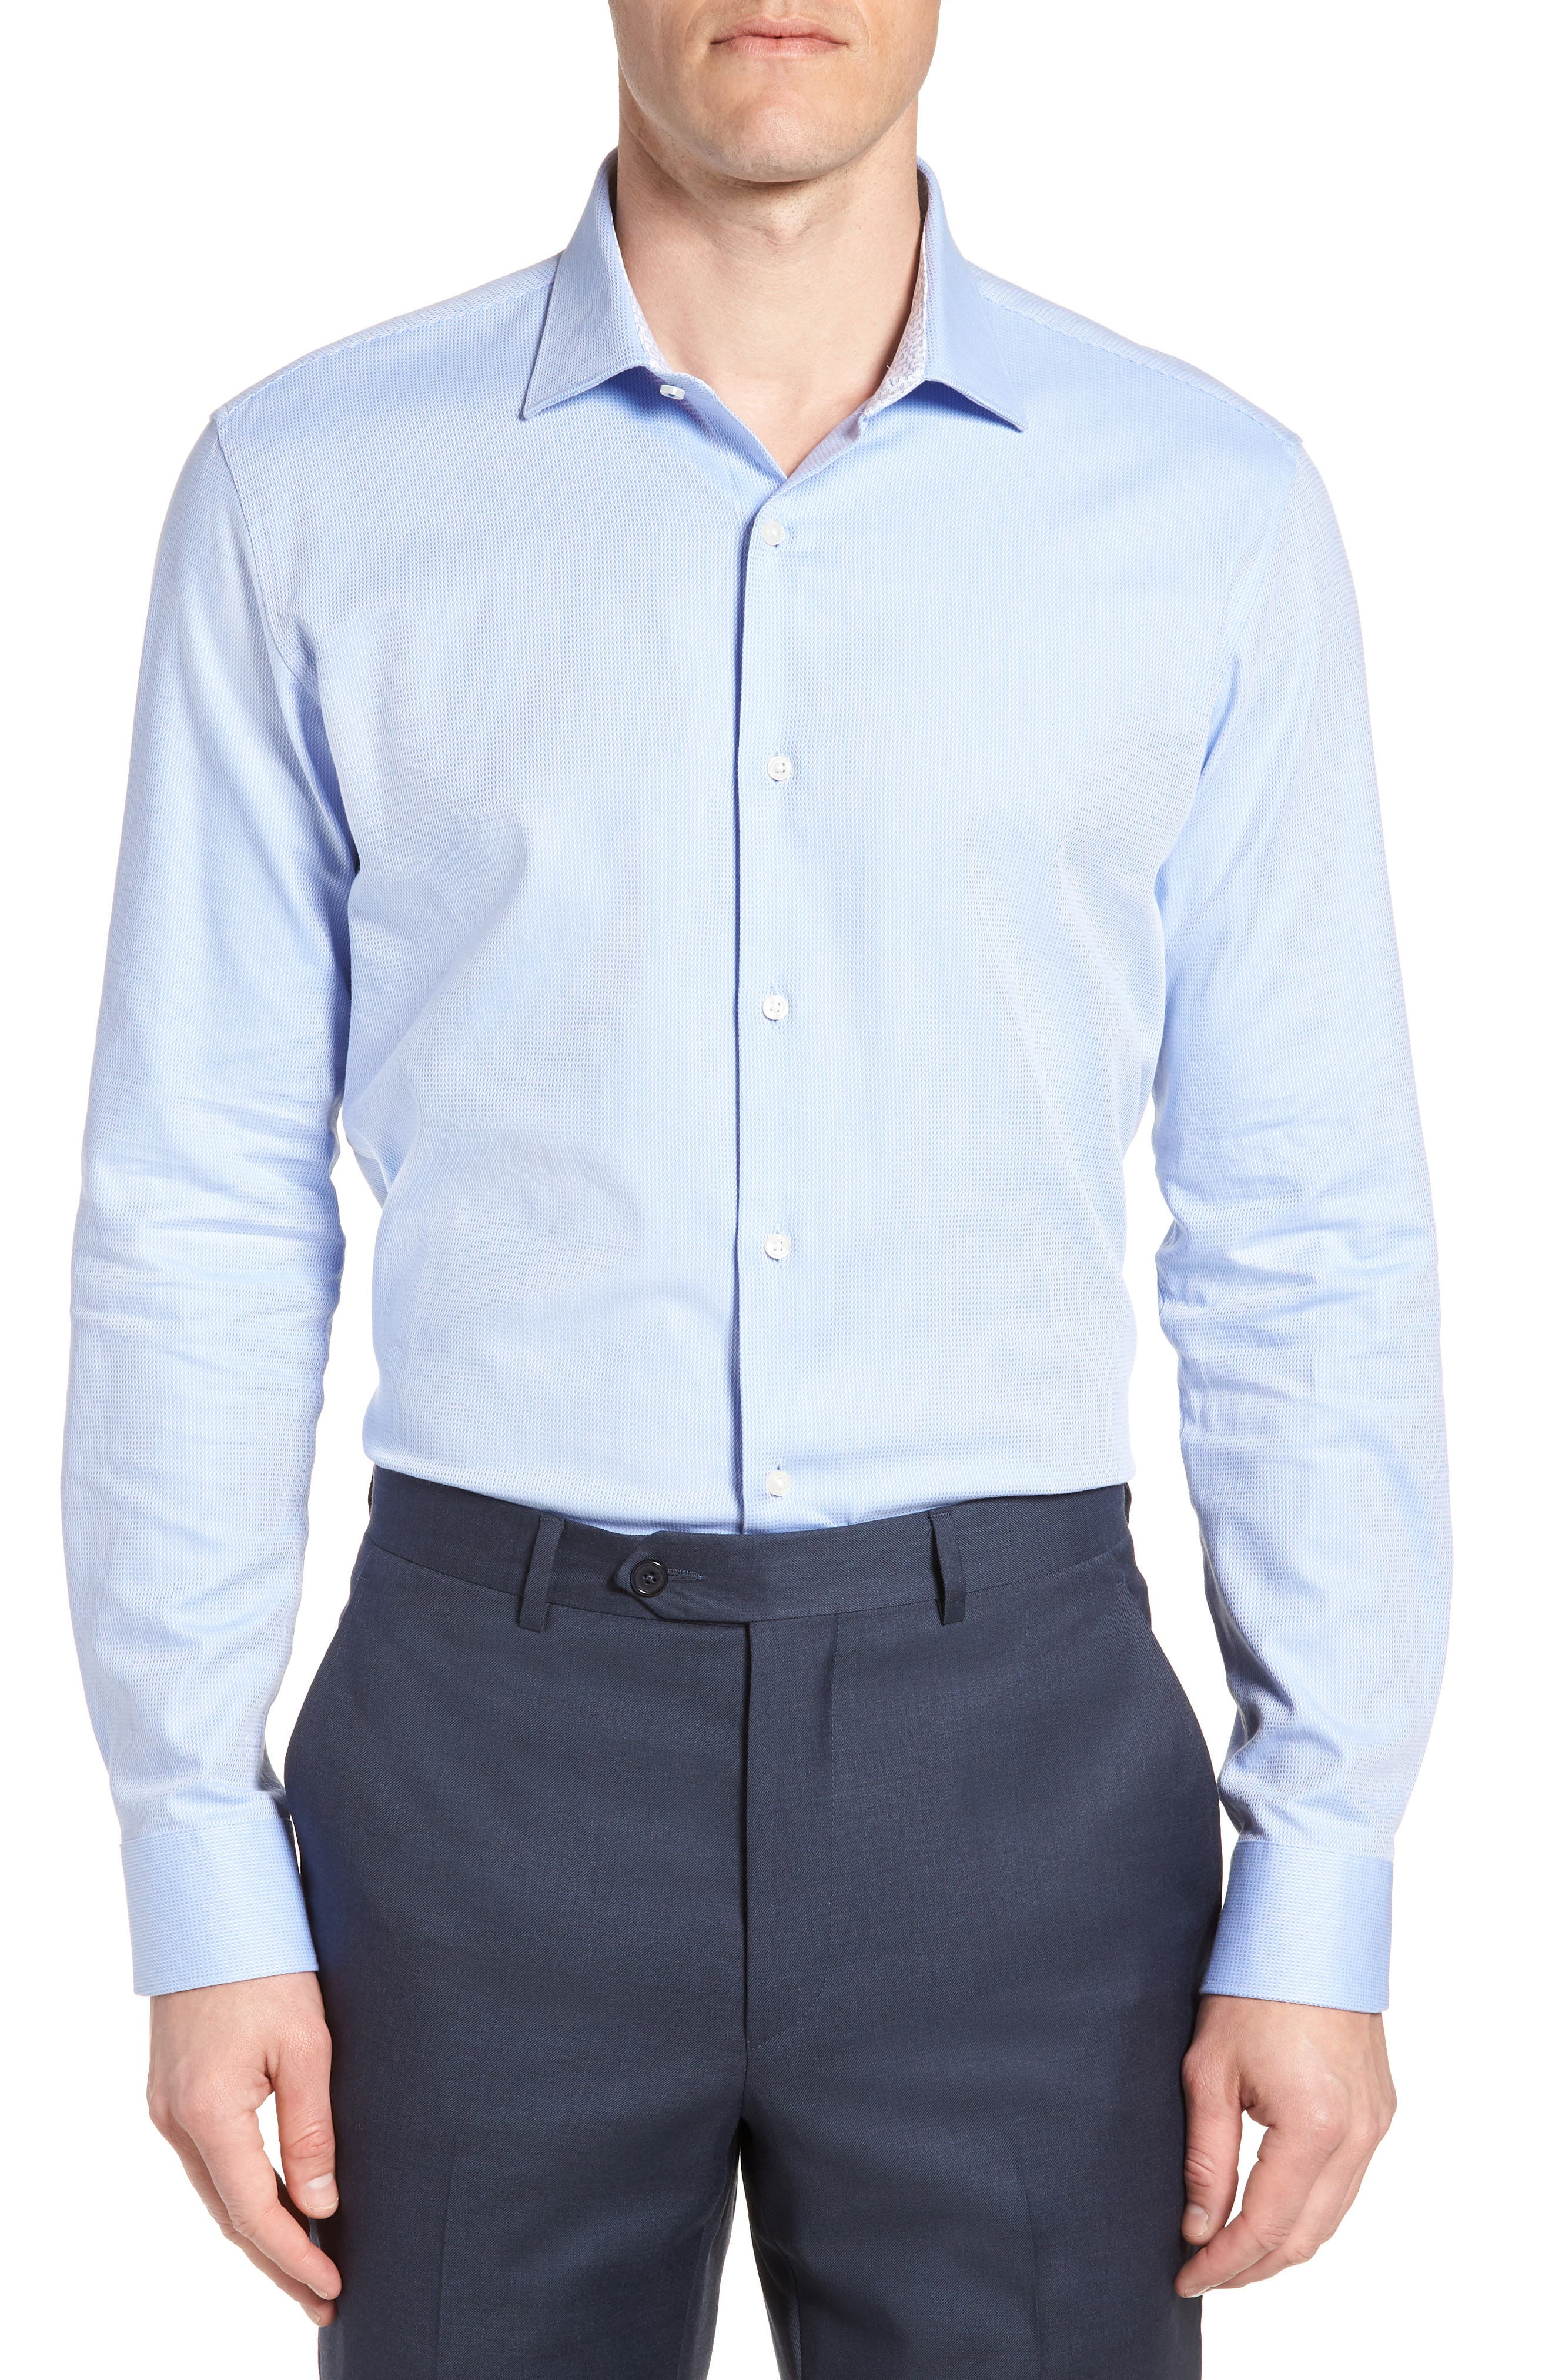 Trim Fit Stretch Performance Dress Shirt,                             Main thumbnail 1, color,                             BLUE